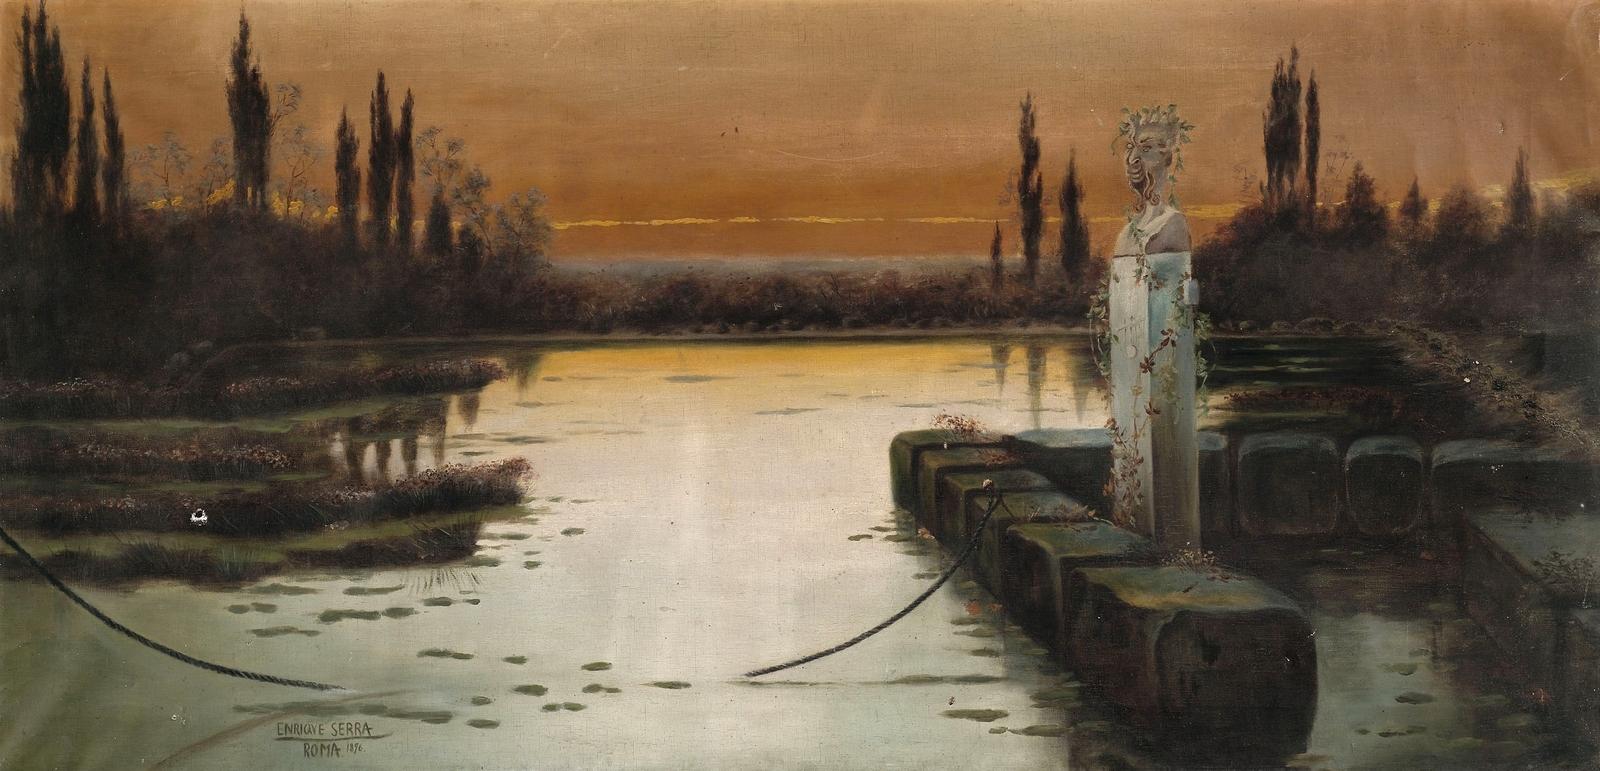 Enrique  Serra  y  Auque  Evening  mood  in  the  Pontine  marshes C